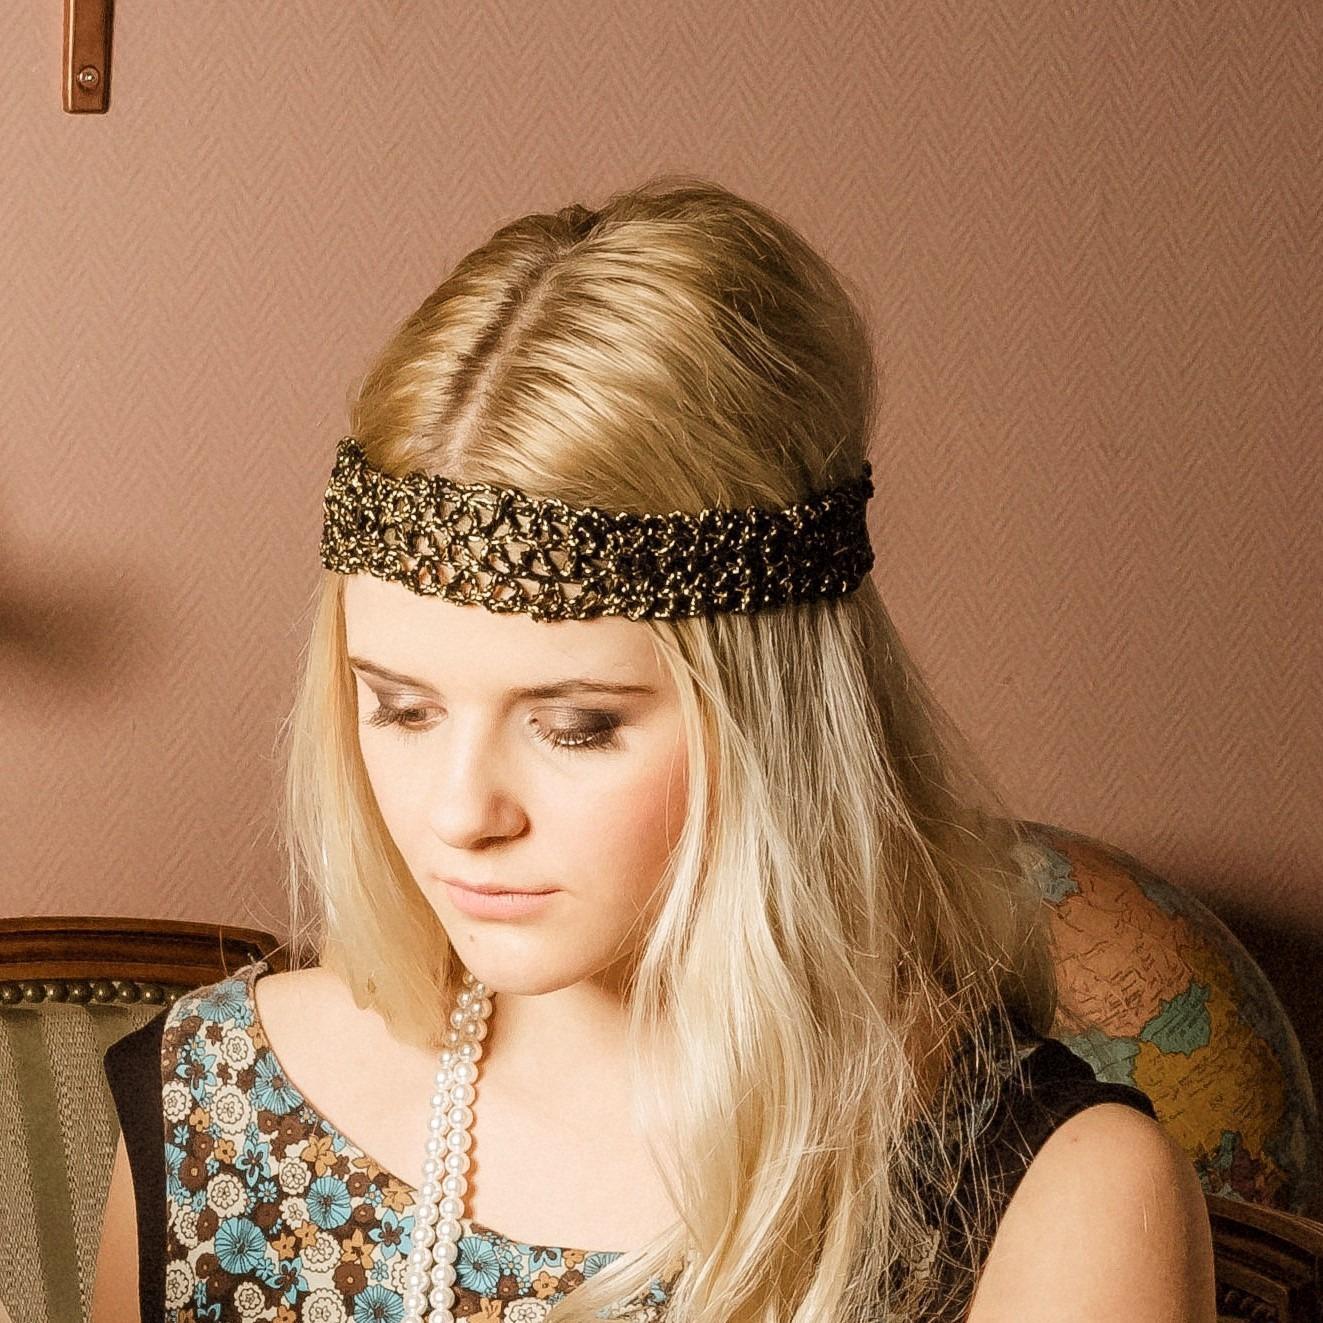 accessoires-coiffure-bandana-headband-ad-hippy-chic-leg-16914788-robe-creation-a35e3-23e26_big